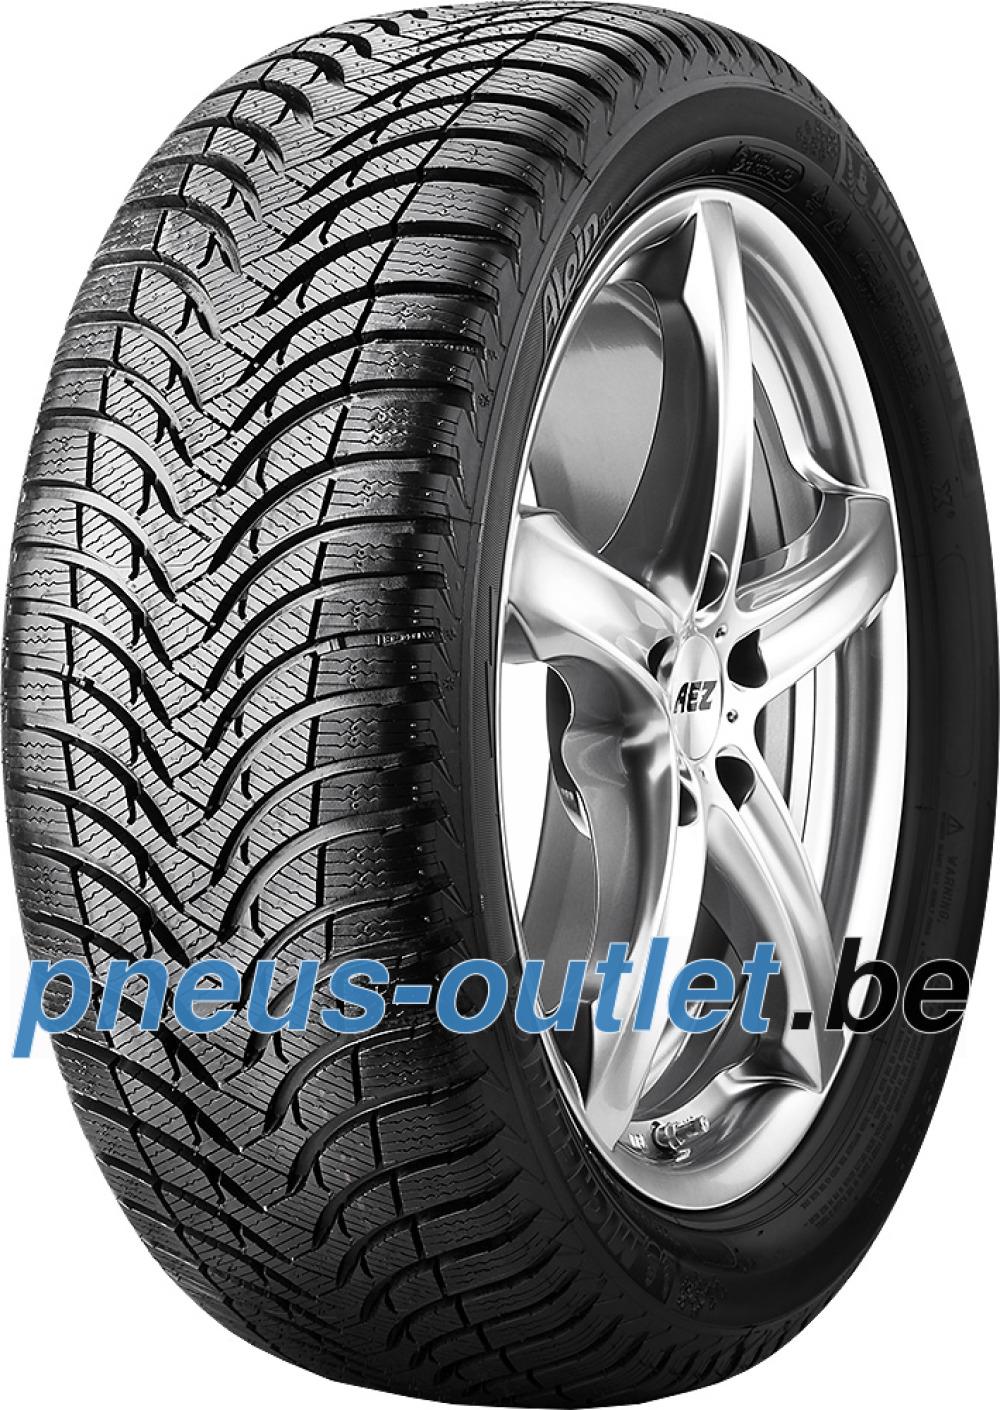 Michelin Alpin A4 ( 185/60 R15 88H XL , AO )